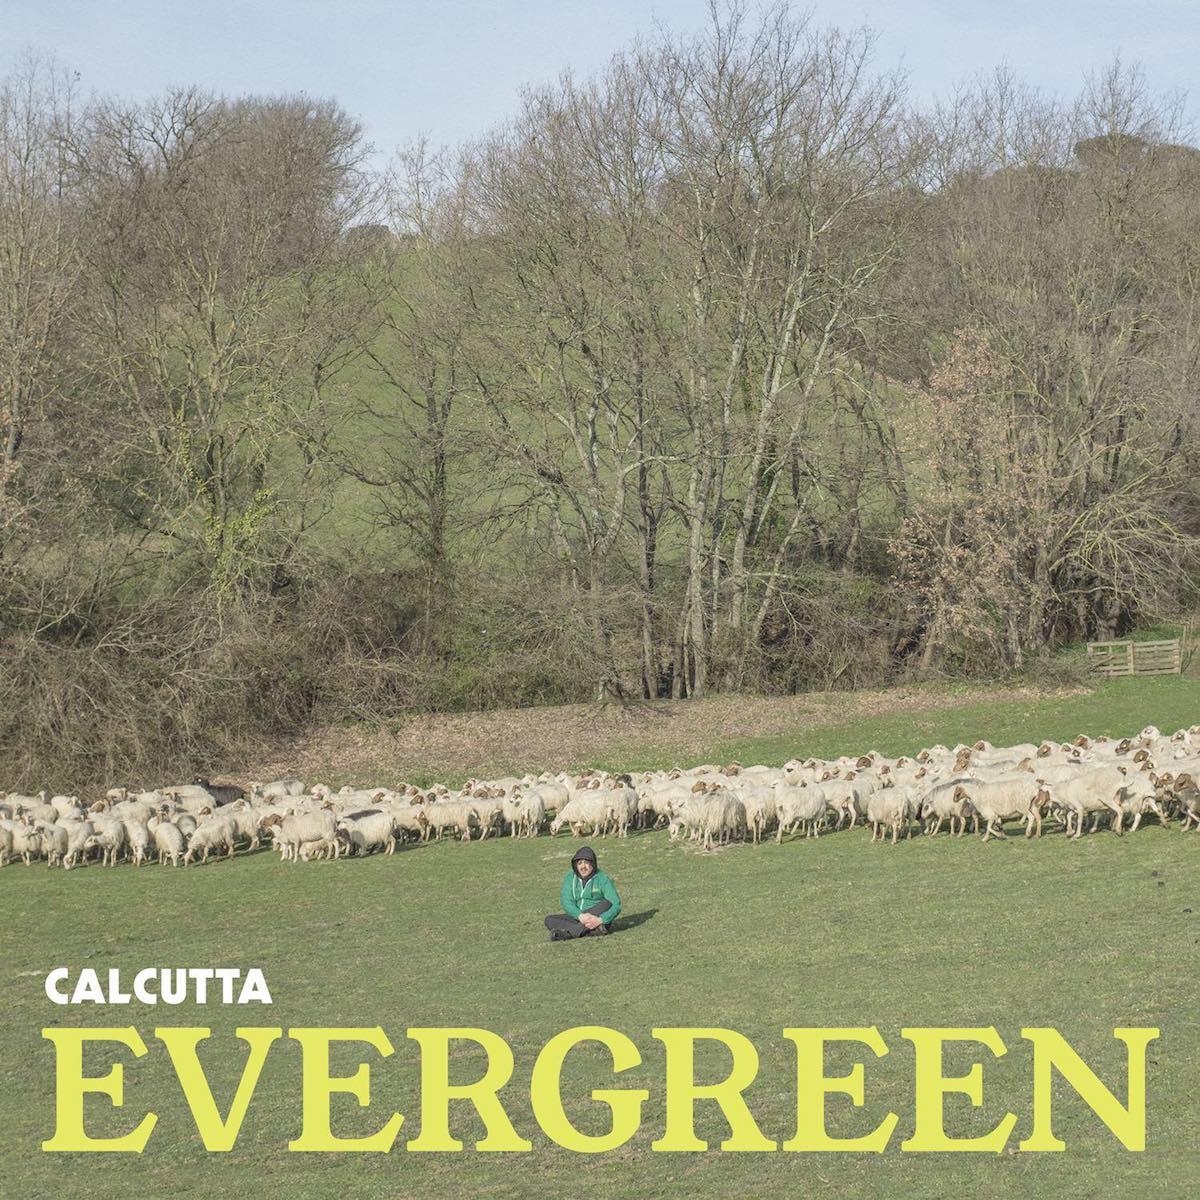 Evergreen - Calcutta